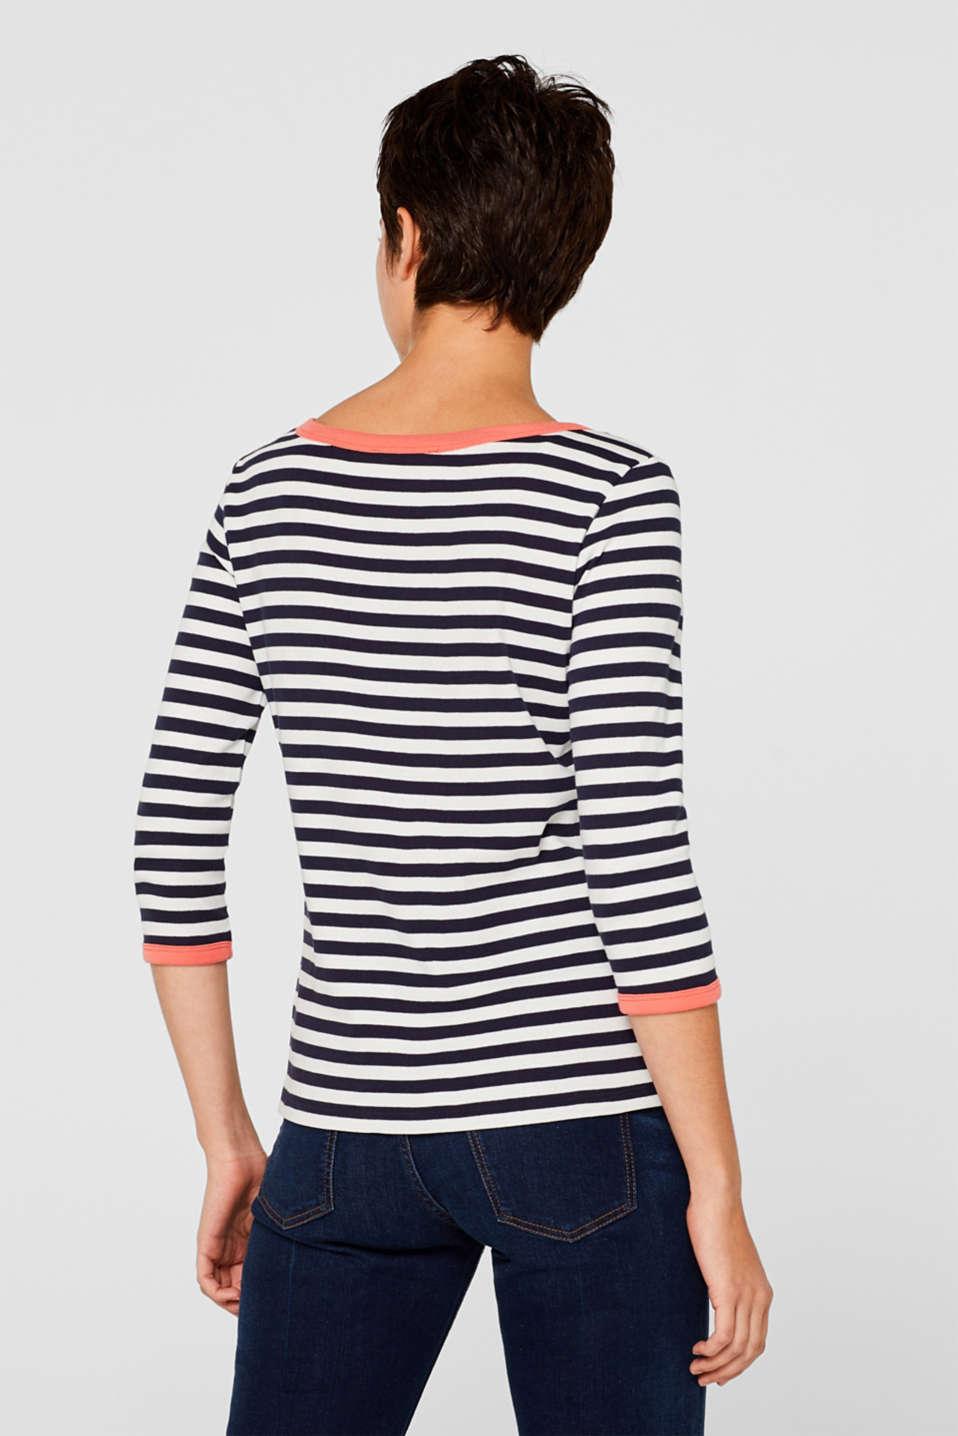 Accent trim T-shirt, 100% cotton, NAVY, detail image number 3